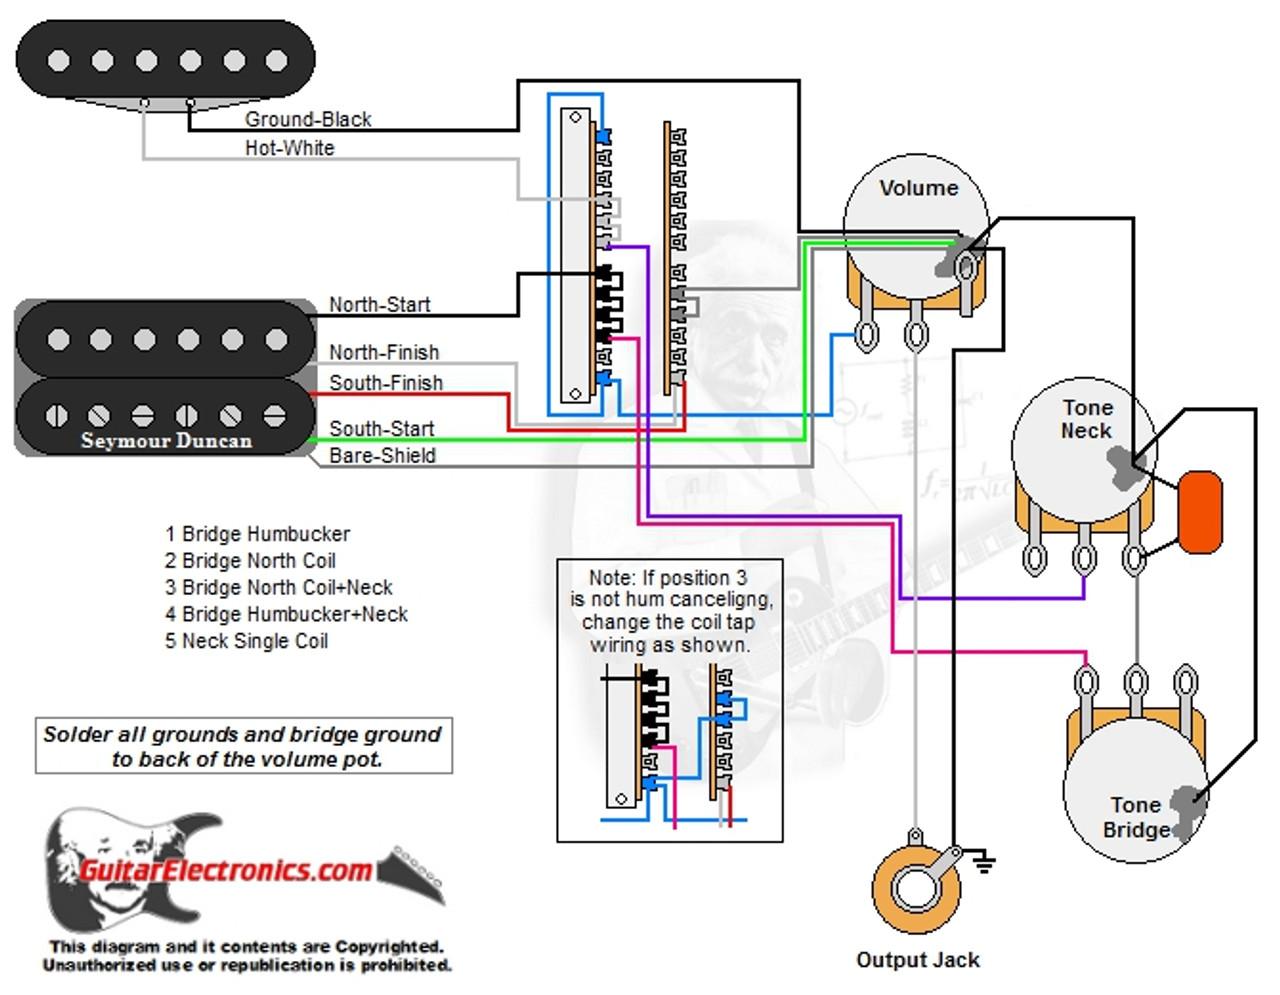 1 Humbucker/1 Single Coil/5-Way Lever Switch/1 Volume/2